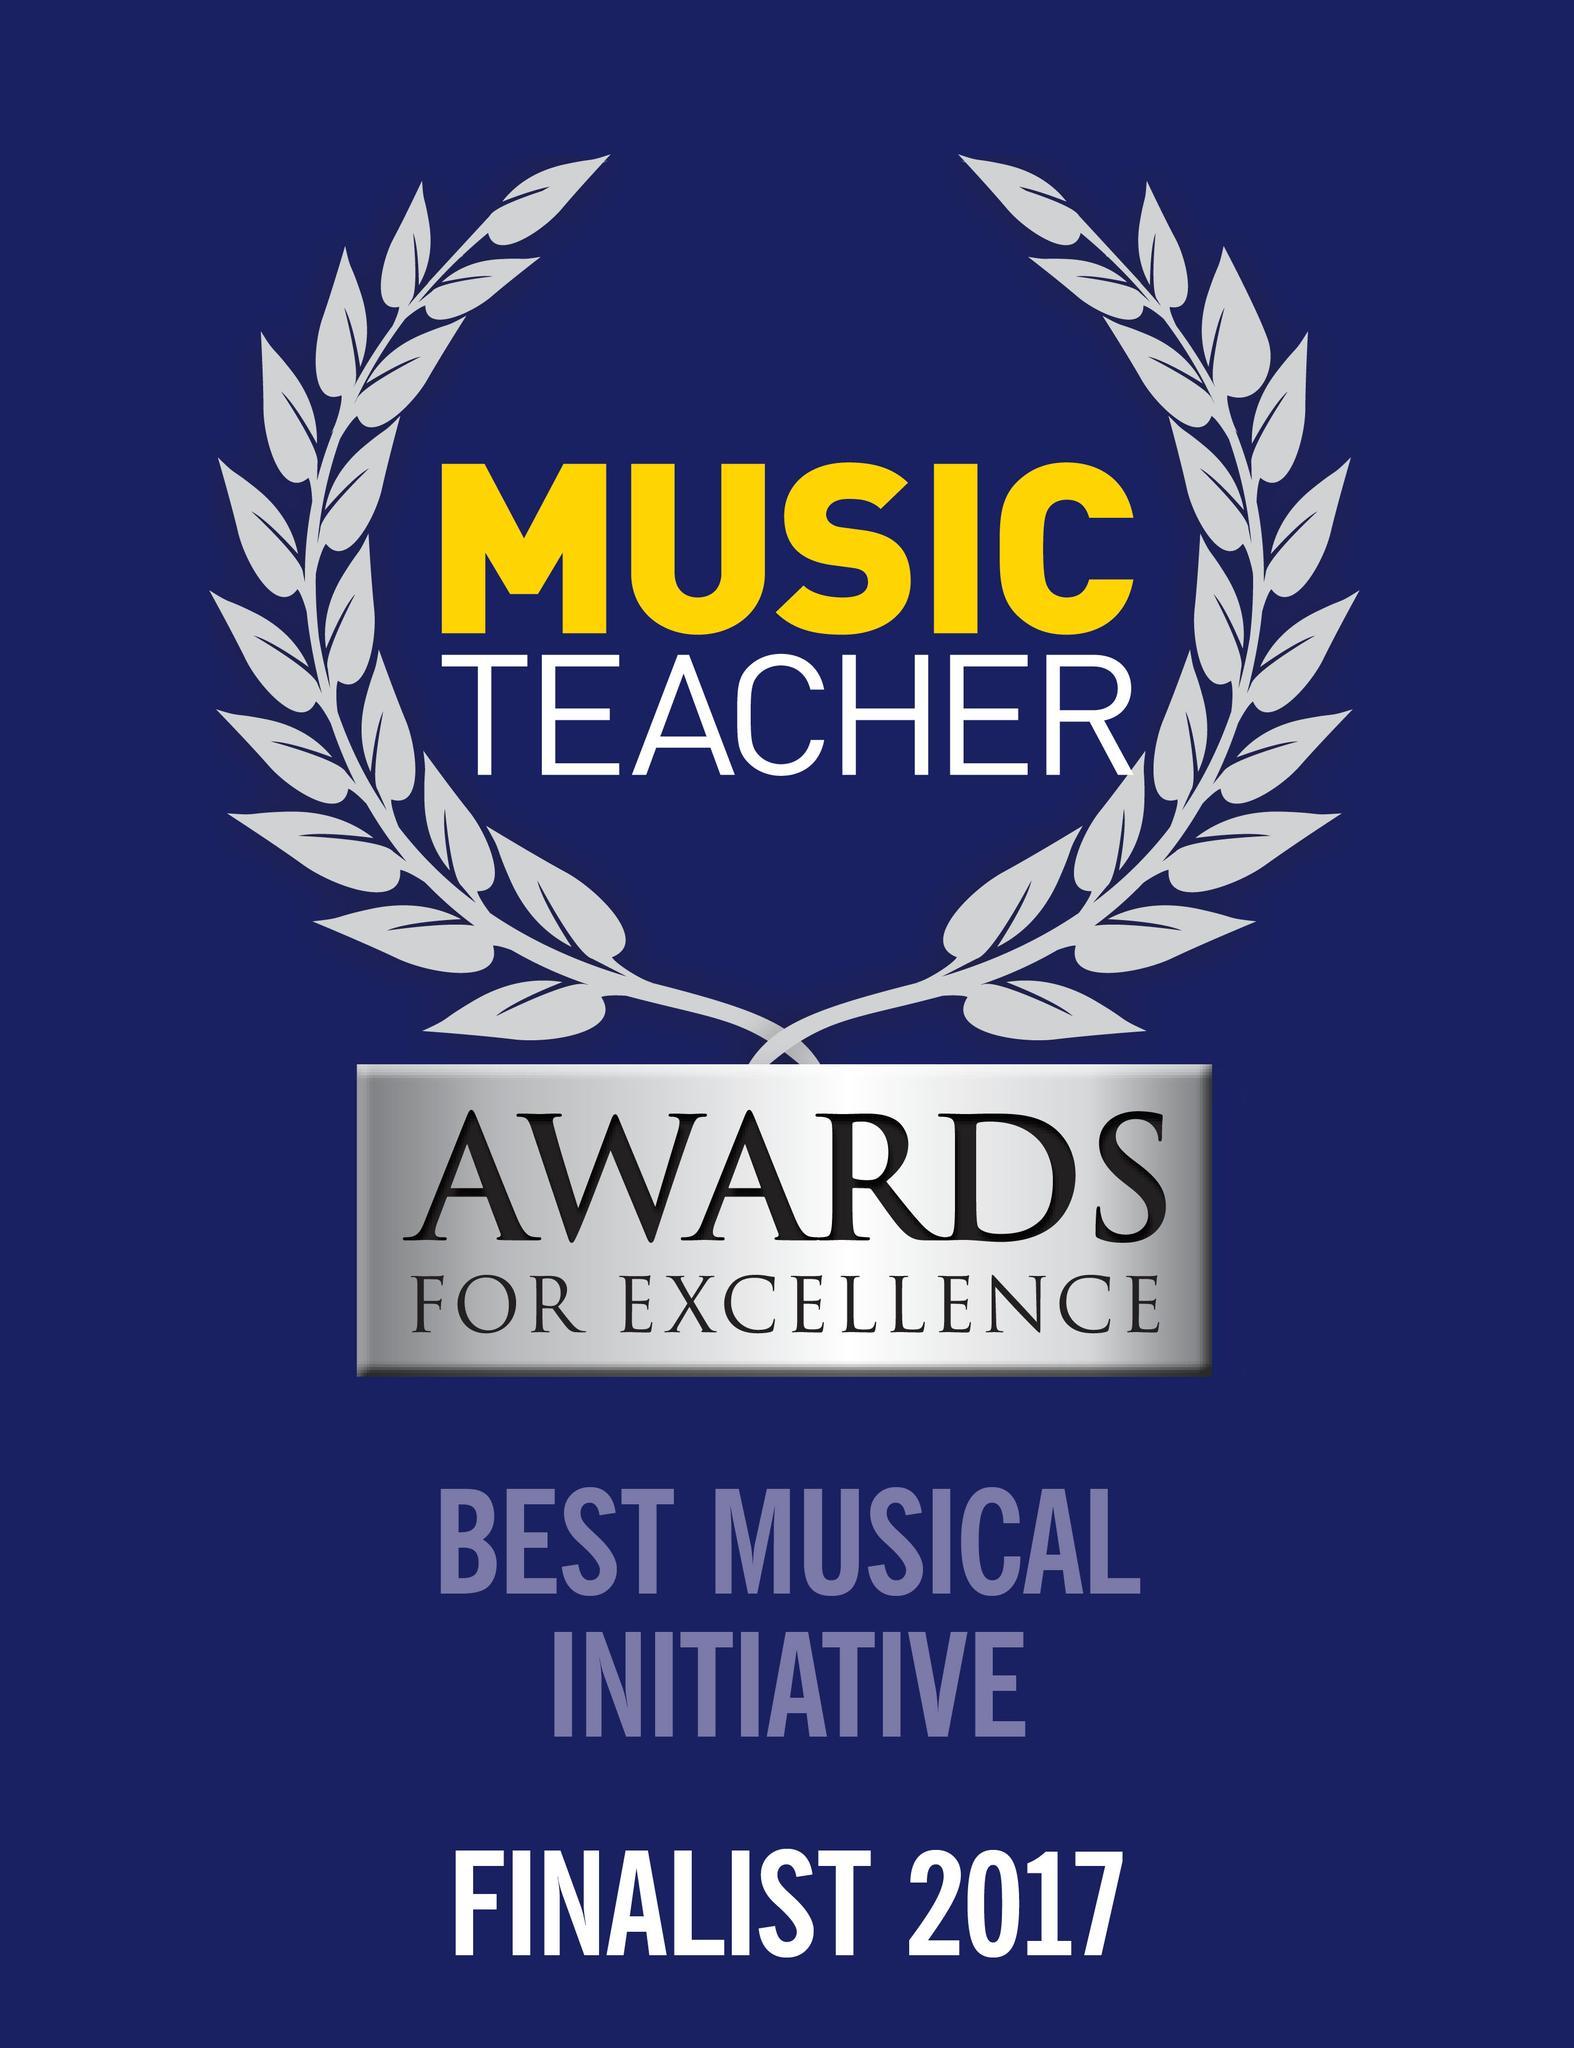 MTAwards17-Musical-Initiative-Award-Finalist-Badge.jpg